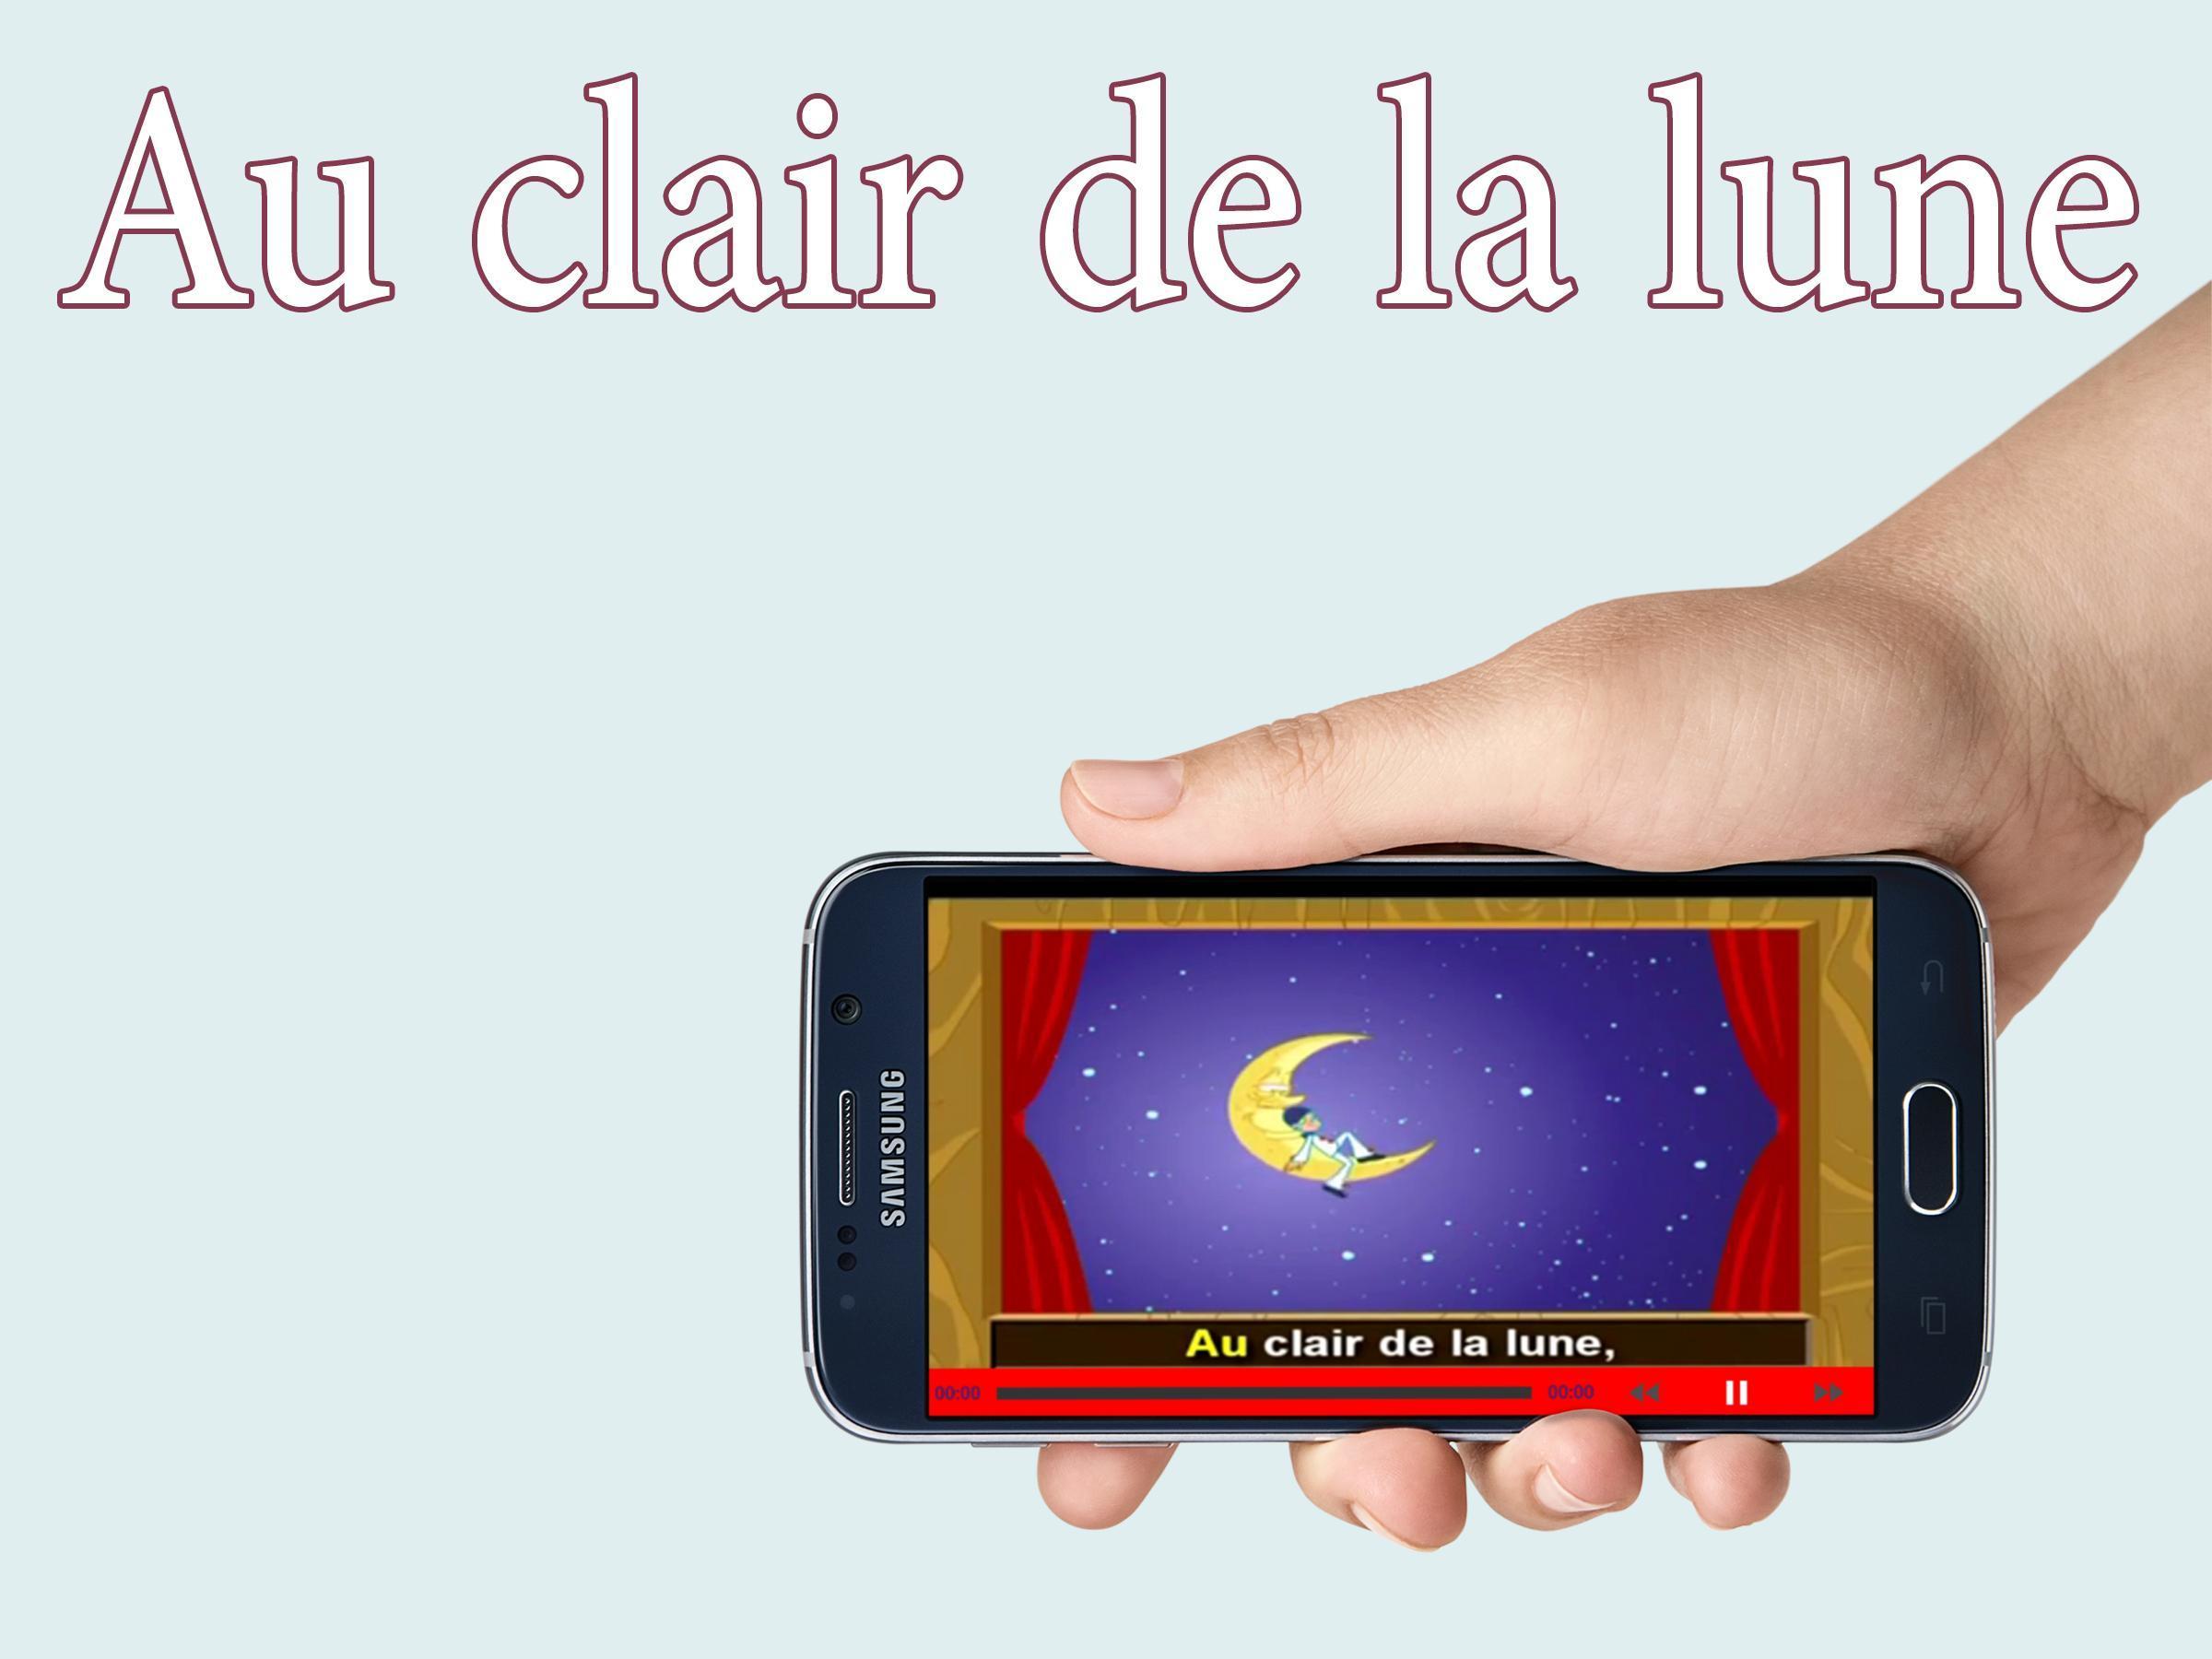 Au Clair De La Lune أغنية Für Android - Apk Herunterladen serapportantà Clair De La Lune Lyrics